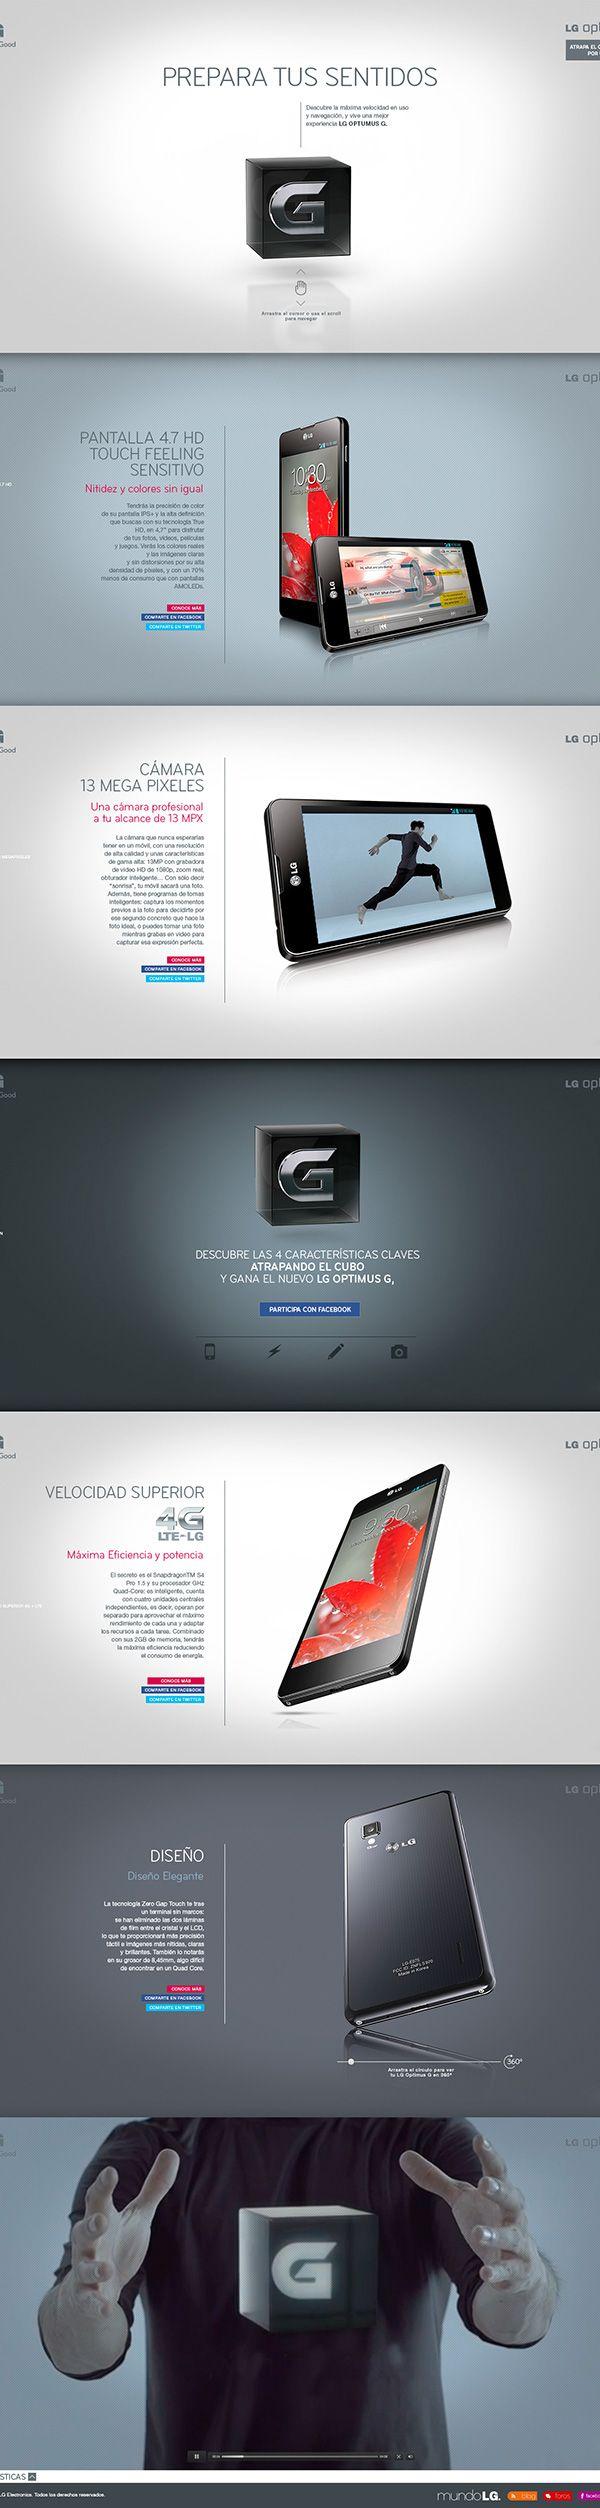 LG Optimus G on Behance. http://bit.ly/1oUJyd0